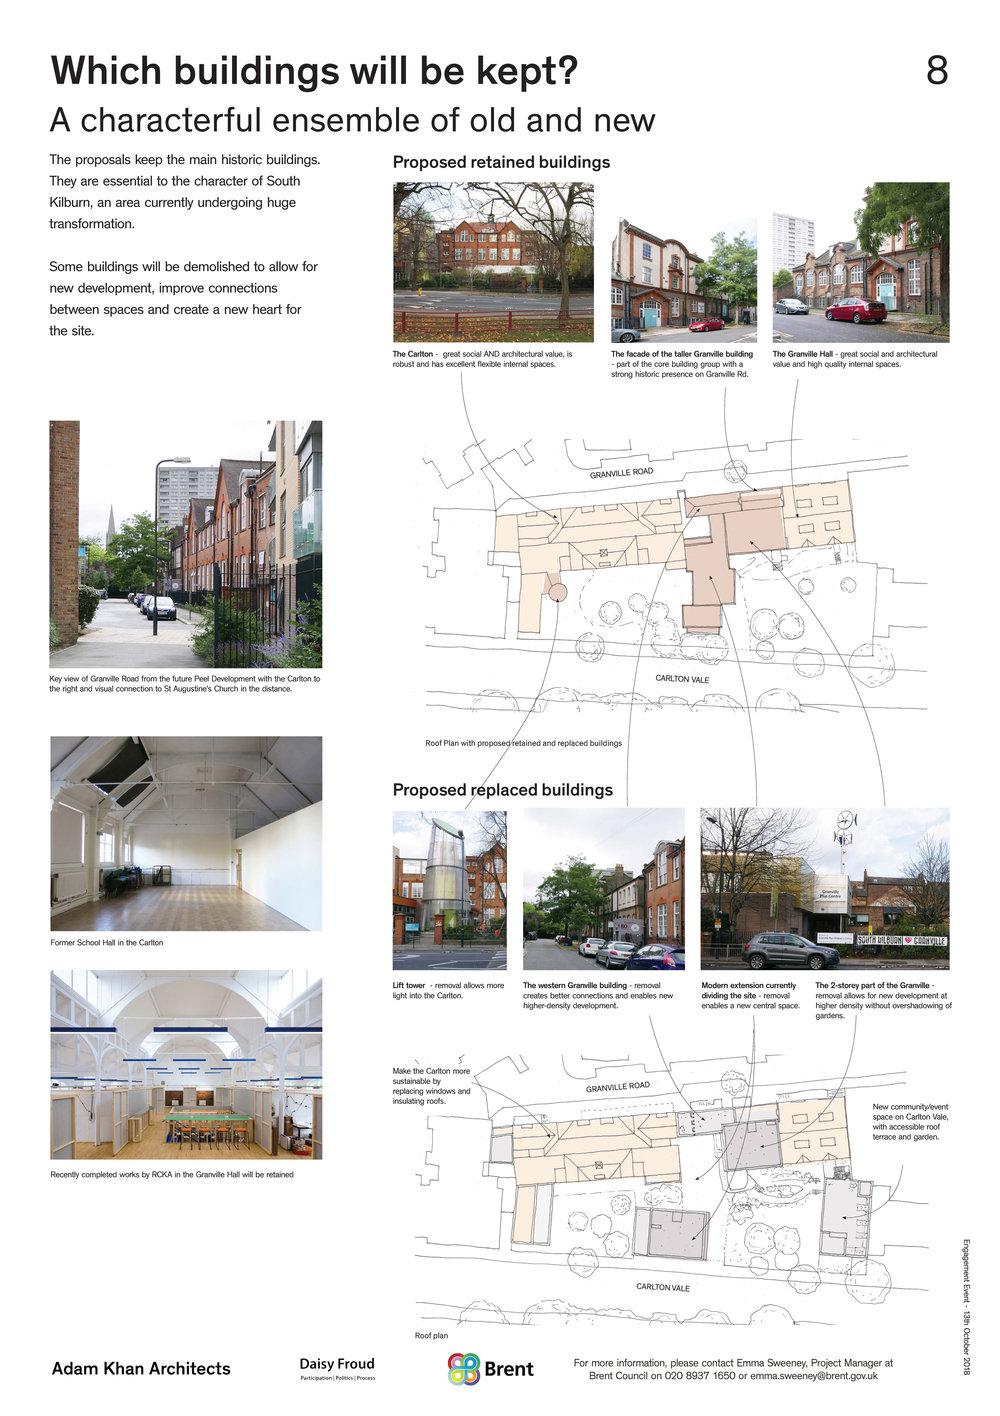 181009_Public-Consultation-03_LN_Page_8.jpg